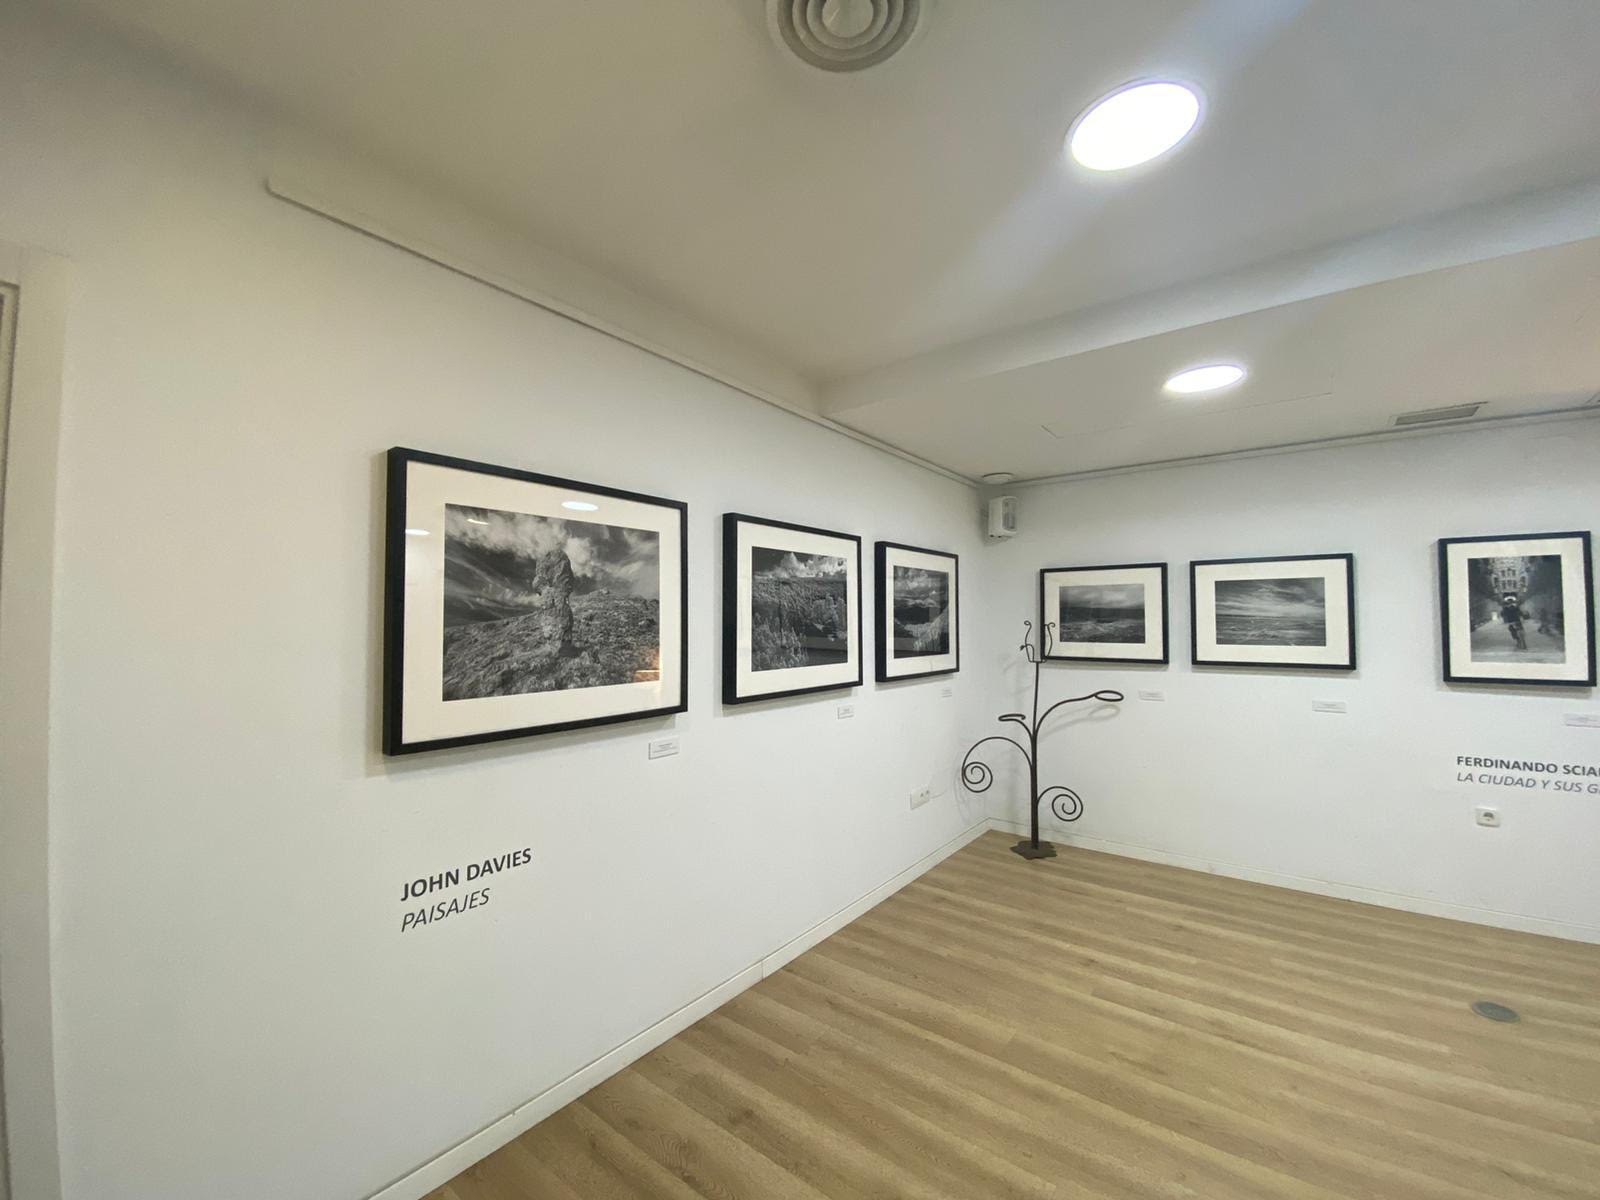 John Davies / Ferdinando Scianna